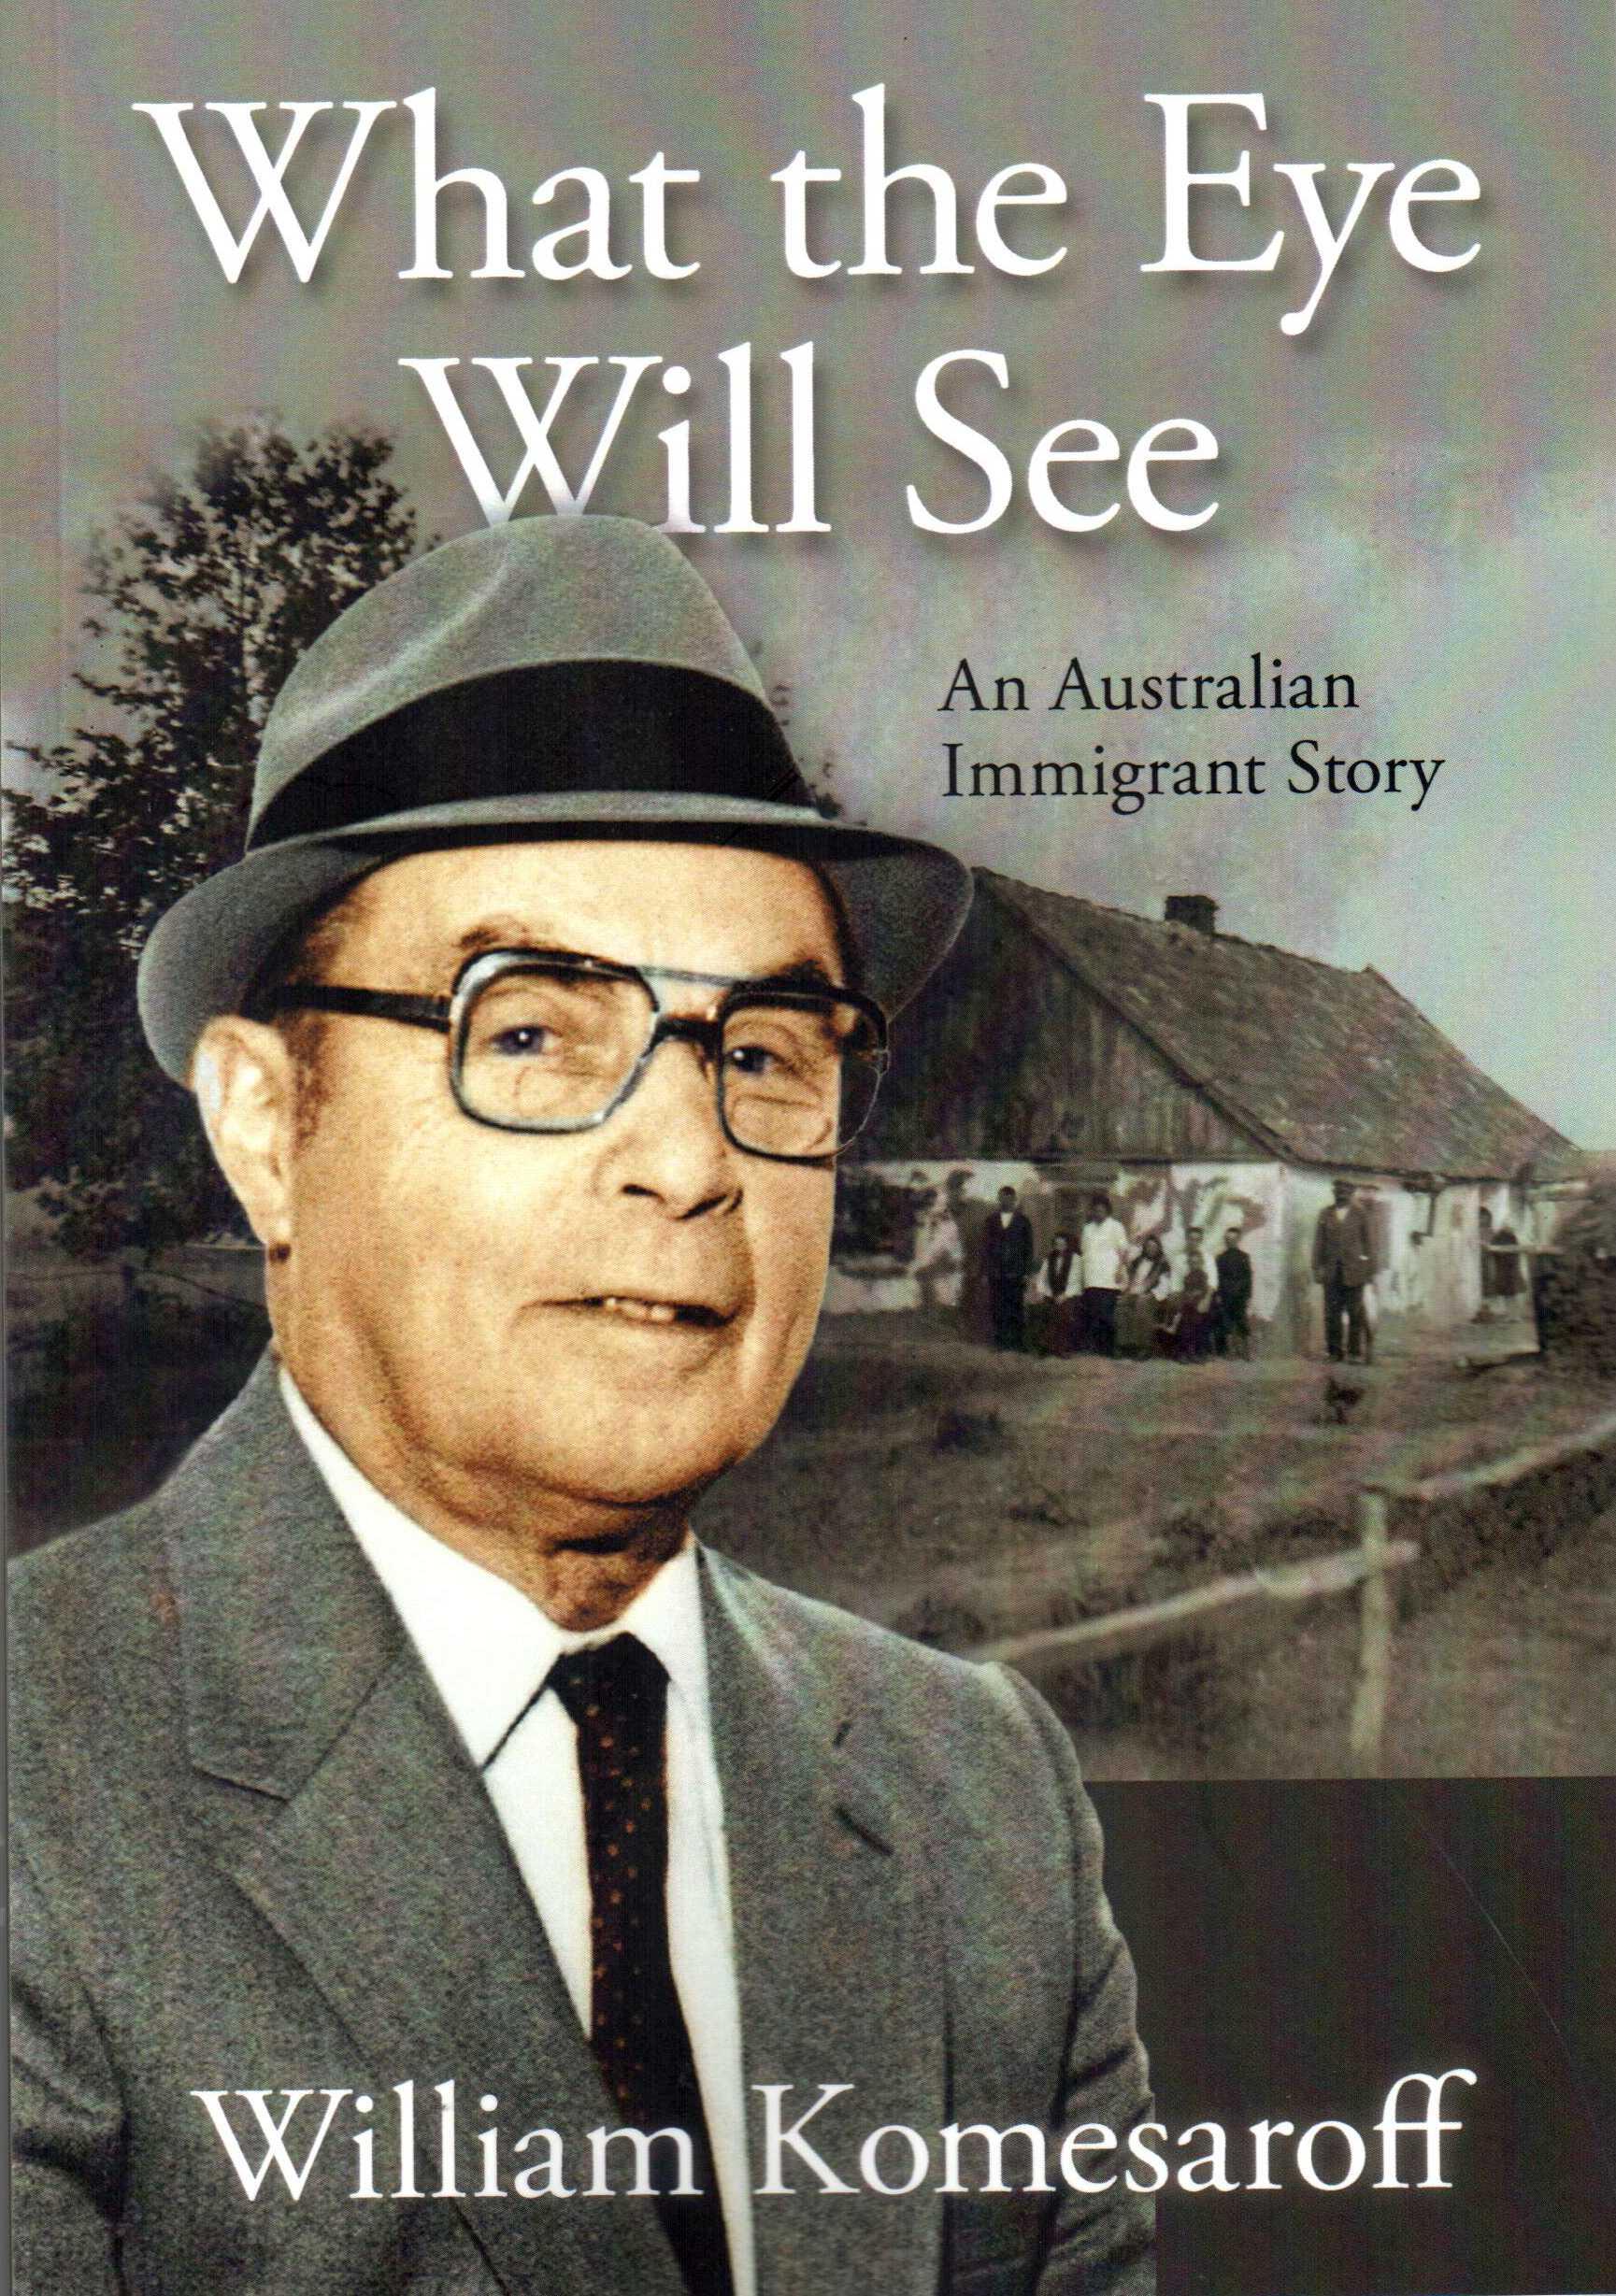 Komesaroff, William: What the eye will see